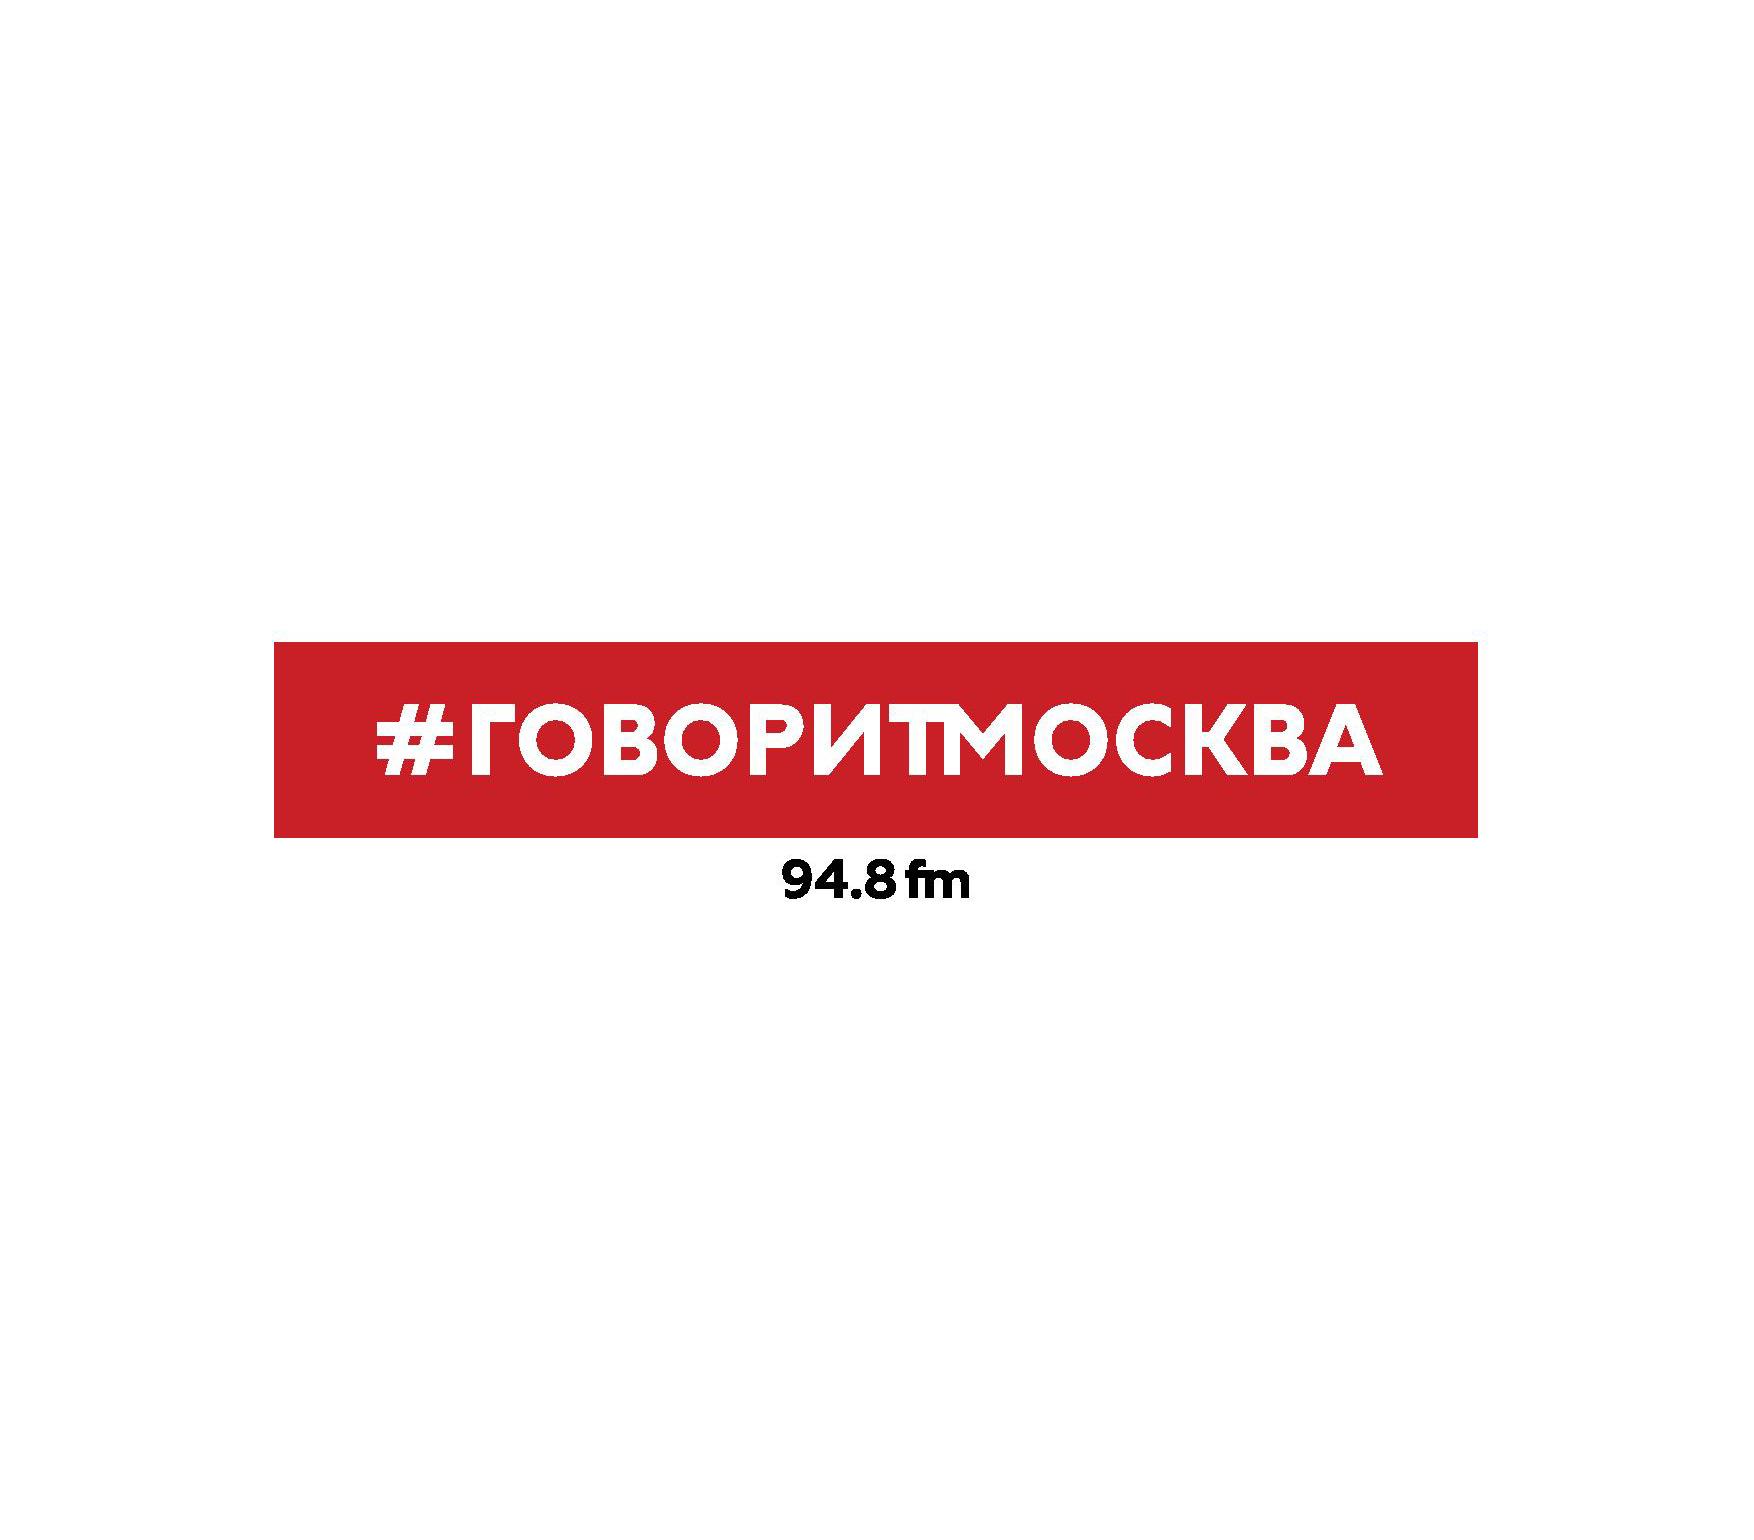 Макс Челноков 9 мая. Юрий Левитан макс челноков 5 мая марат гельман